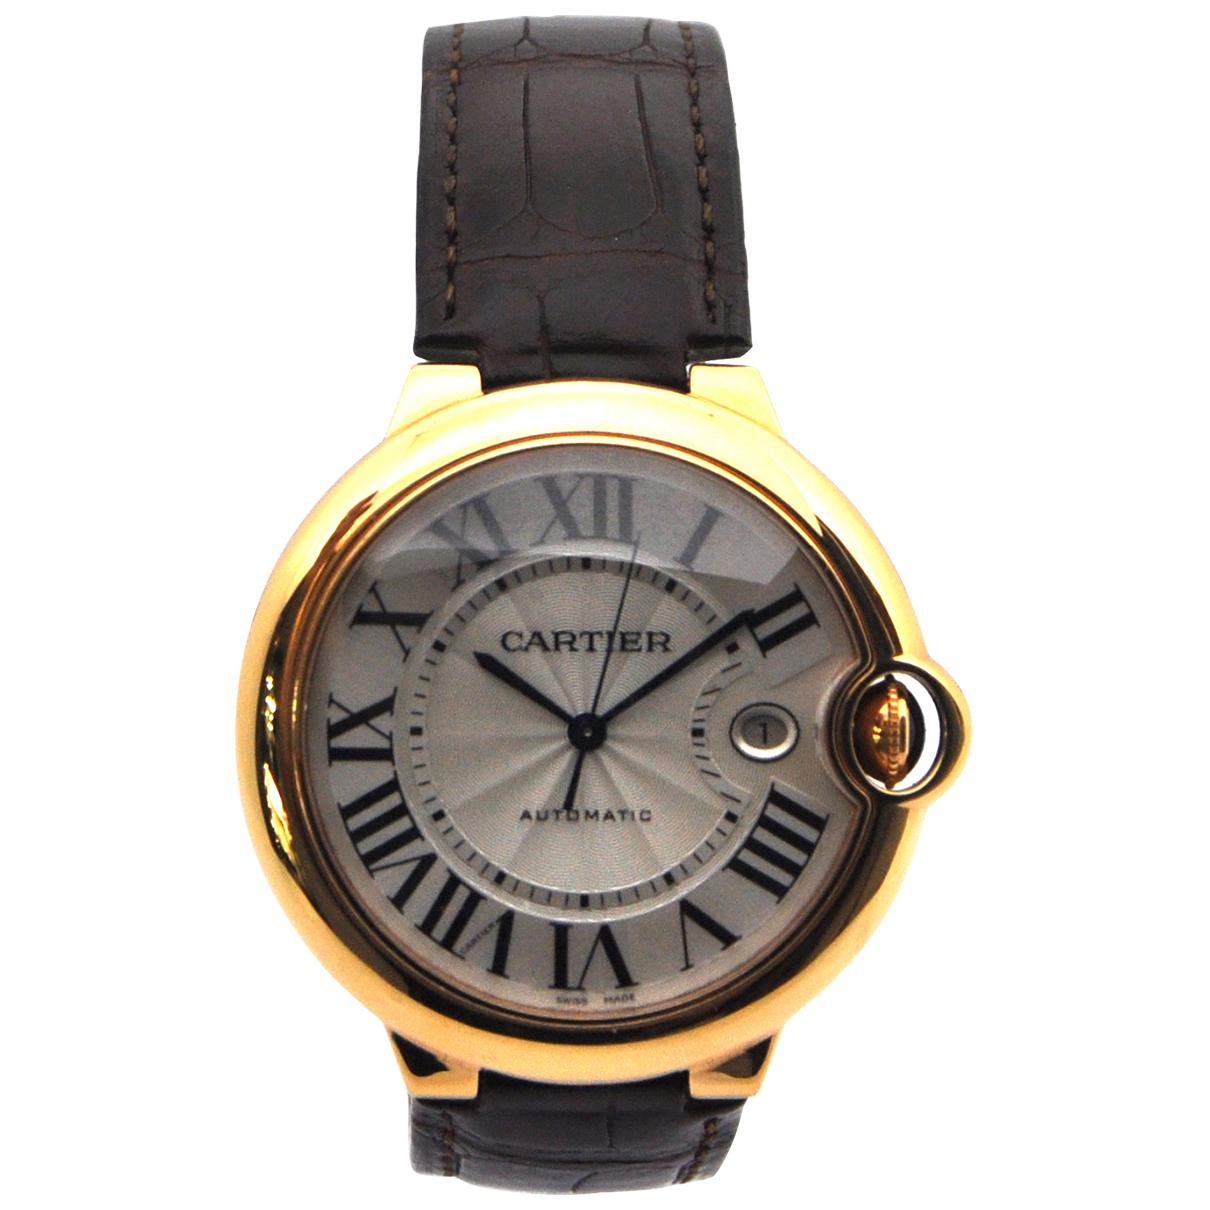 Cartier Ballon bleu Uhr in Rosegold